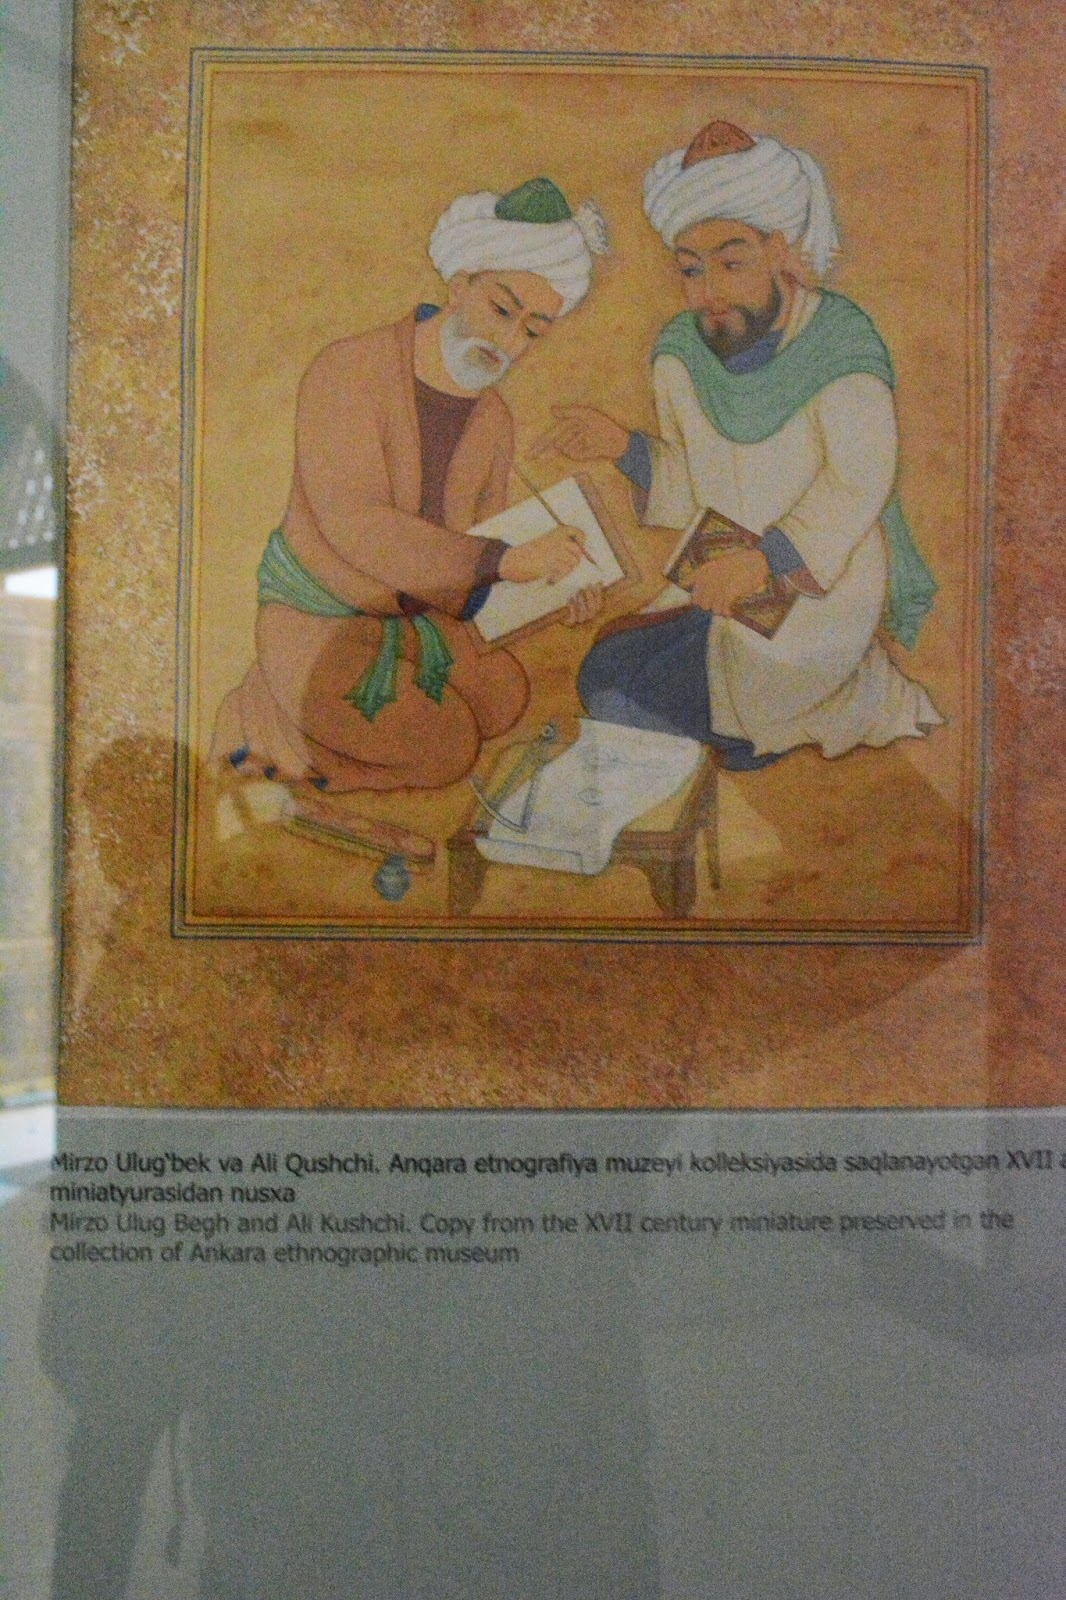 Ali Kuşçu ile Uluğ Bey